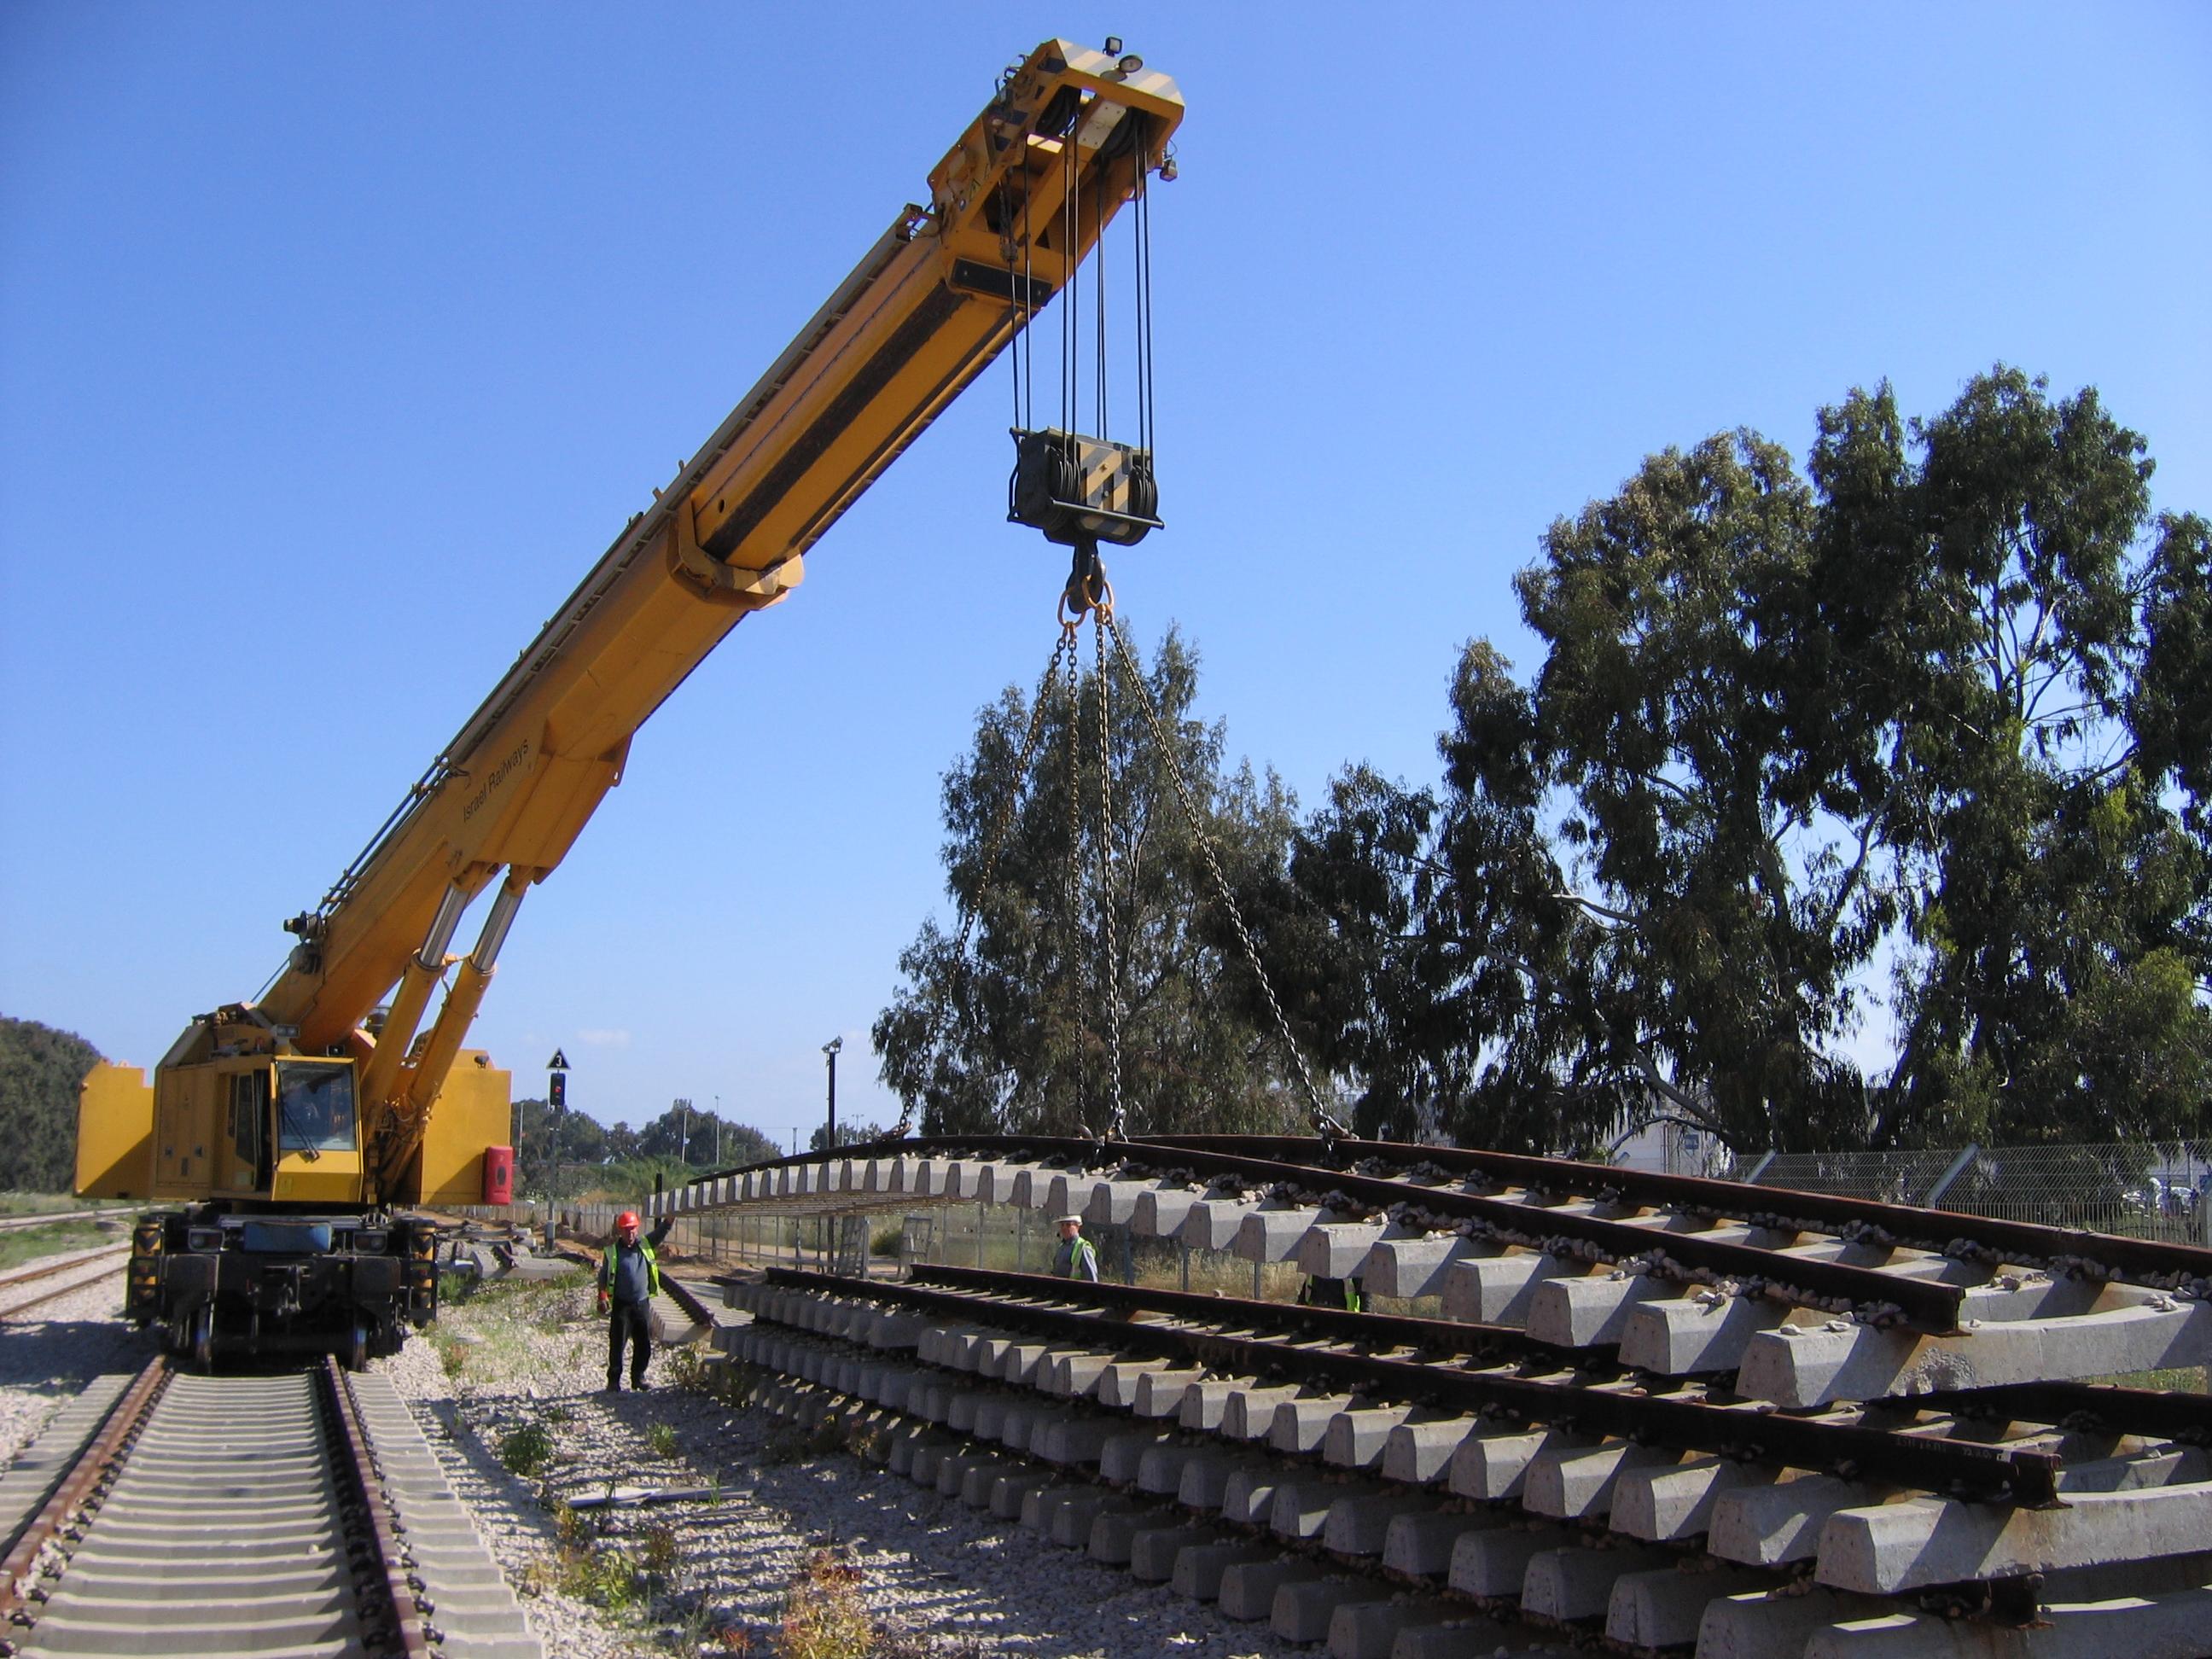 Mobile crane on track